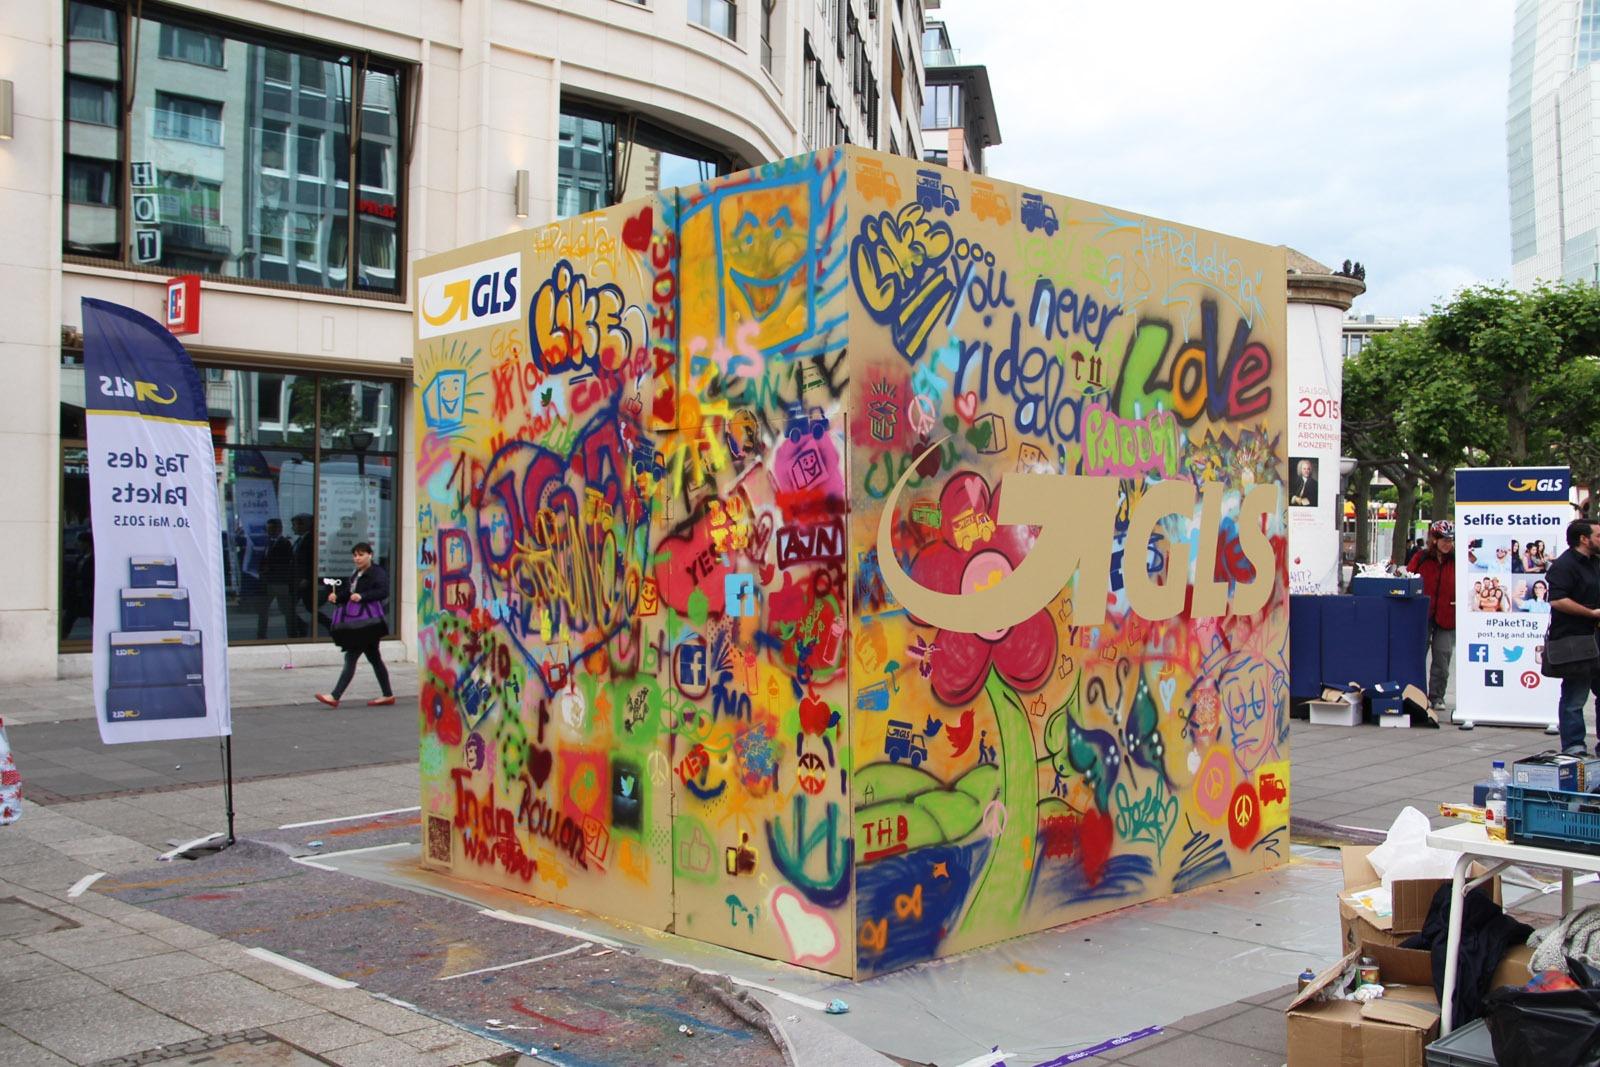 graffitiauftrag-graffitikuenstler-graffitiworkshop-artmos4-gls-frankfurt